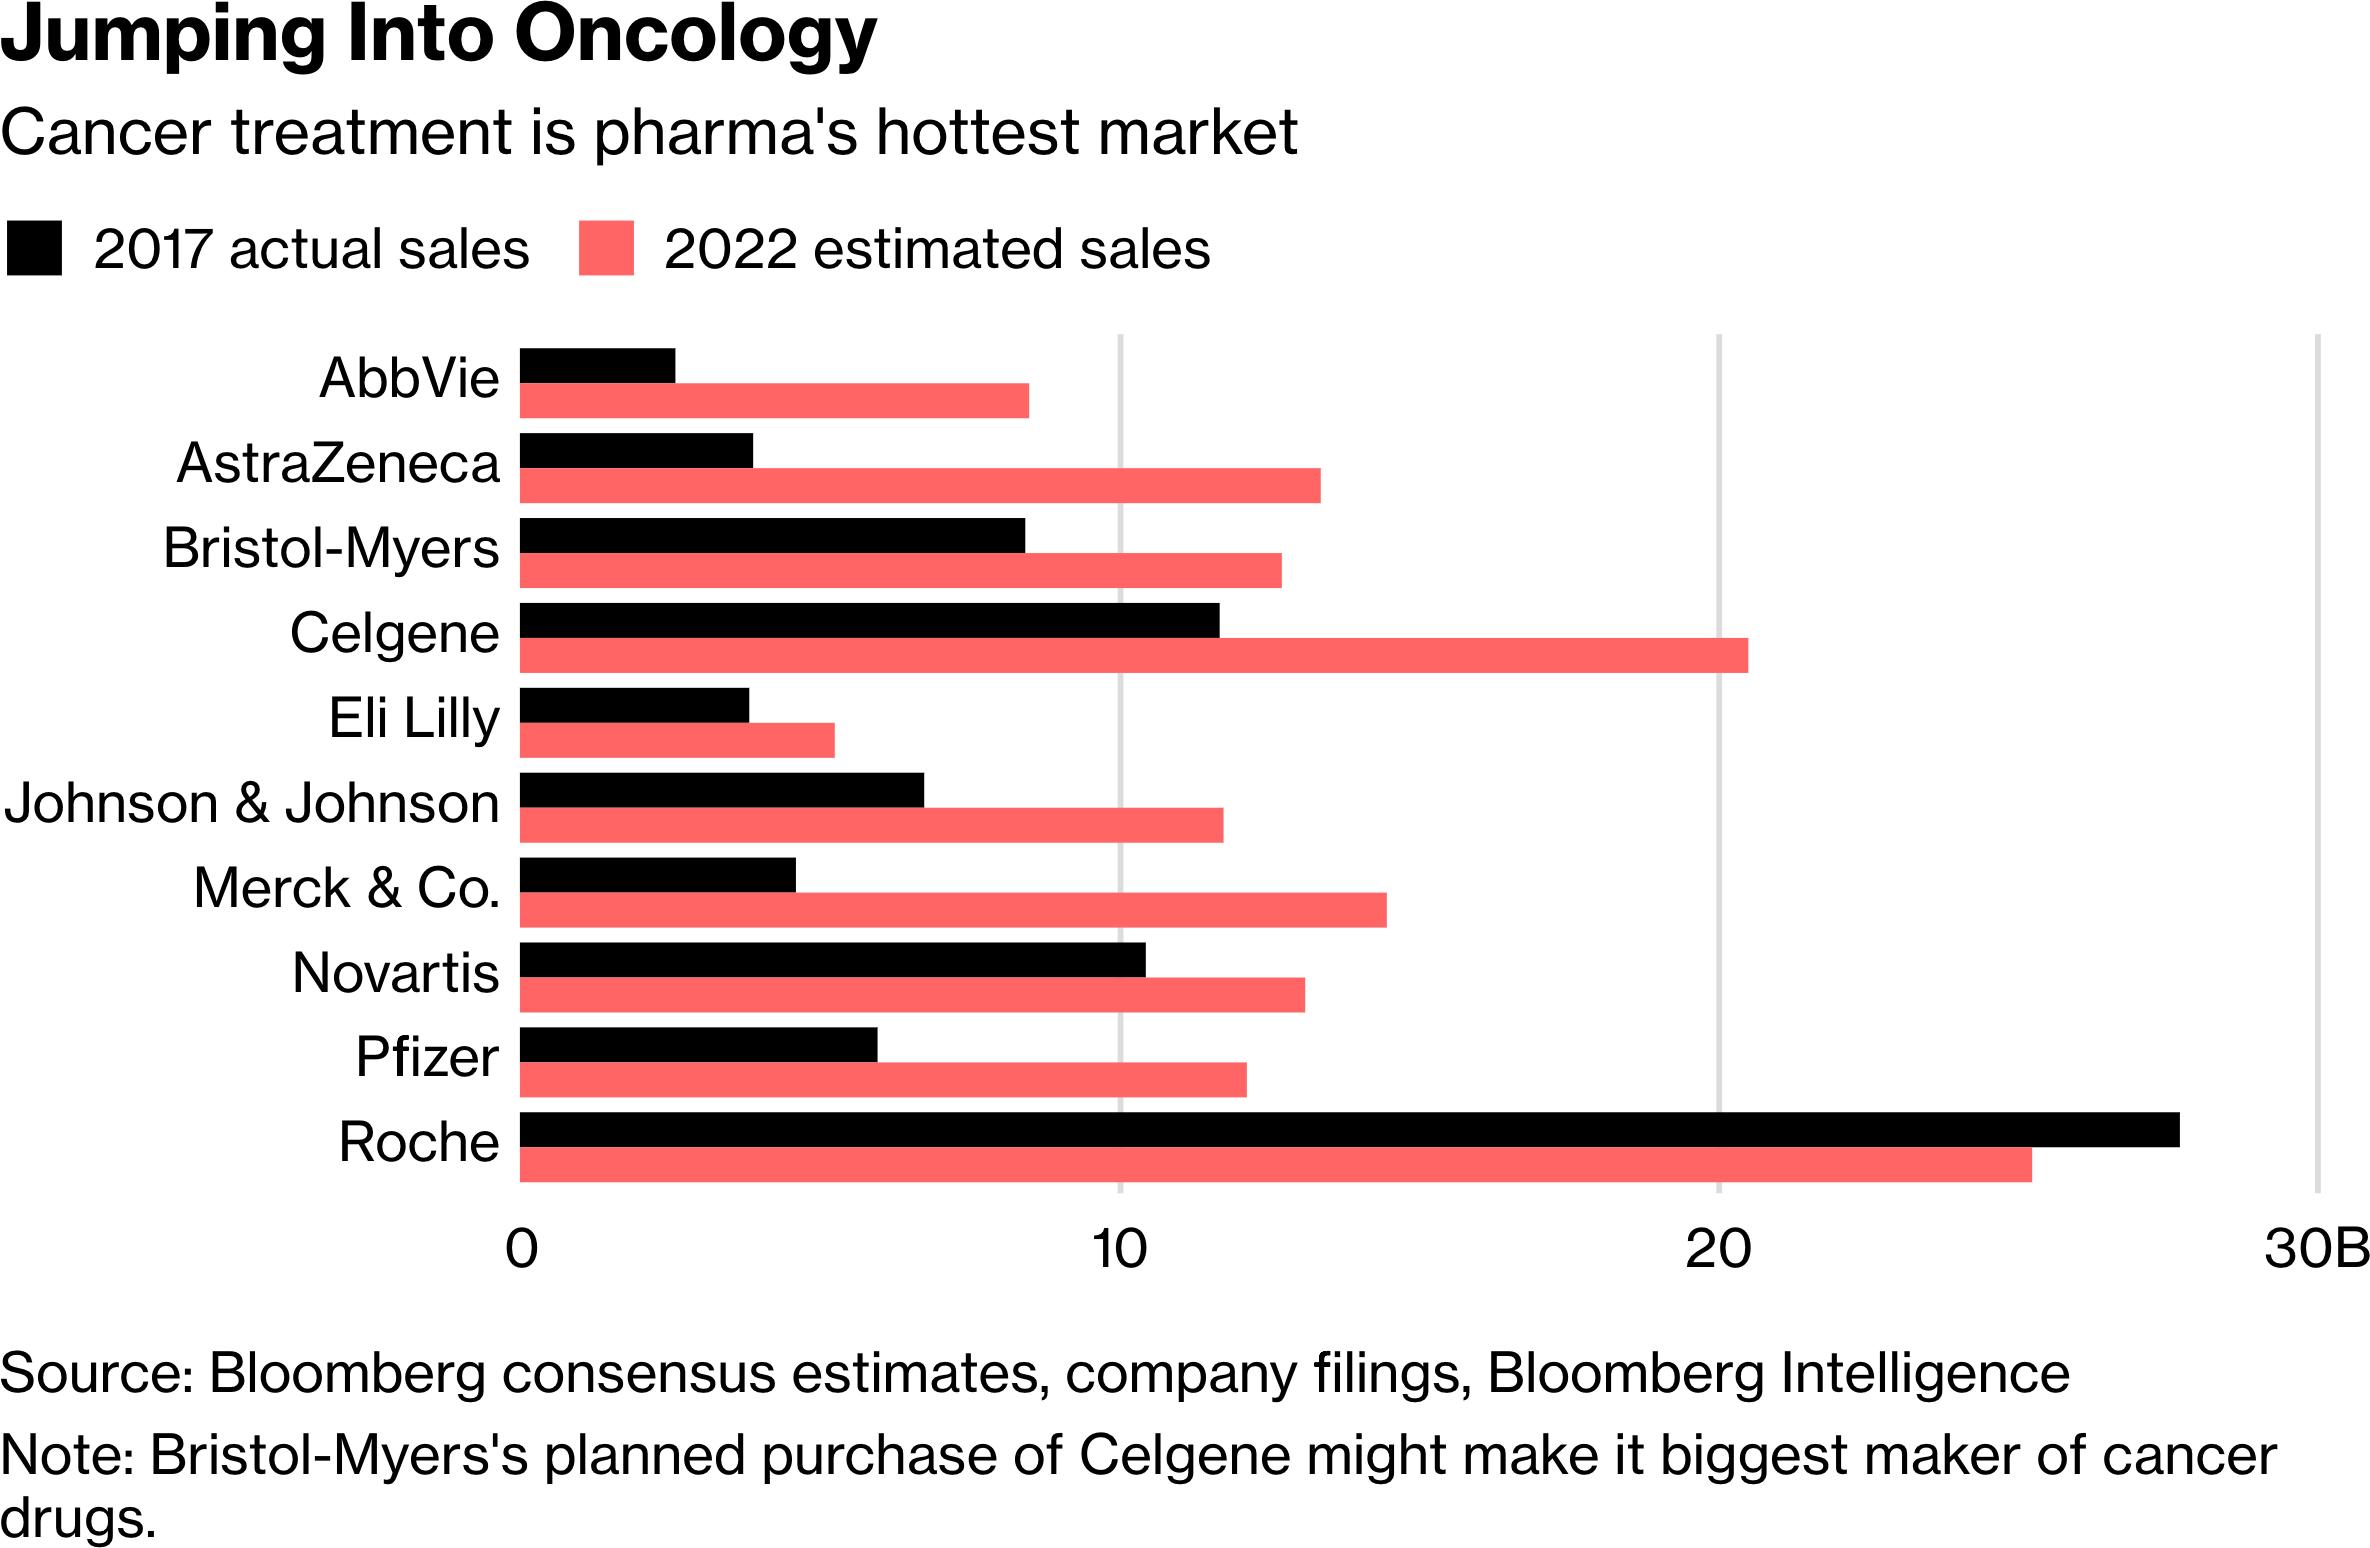 cancer drugs sales 2017 vs 2022 - GlaxoSmithKline и Merck KGaA: иммуноонкологический альянс на четыре миллиарда долларов